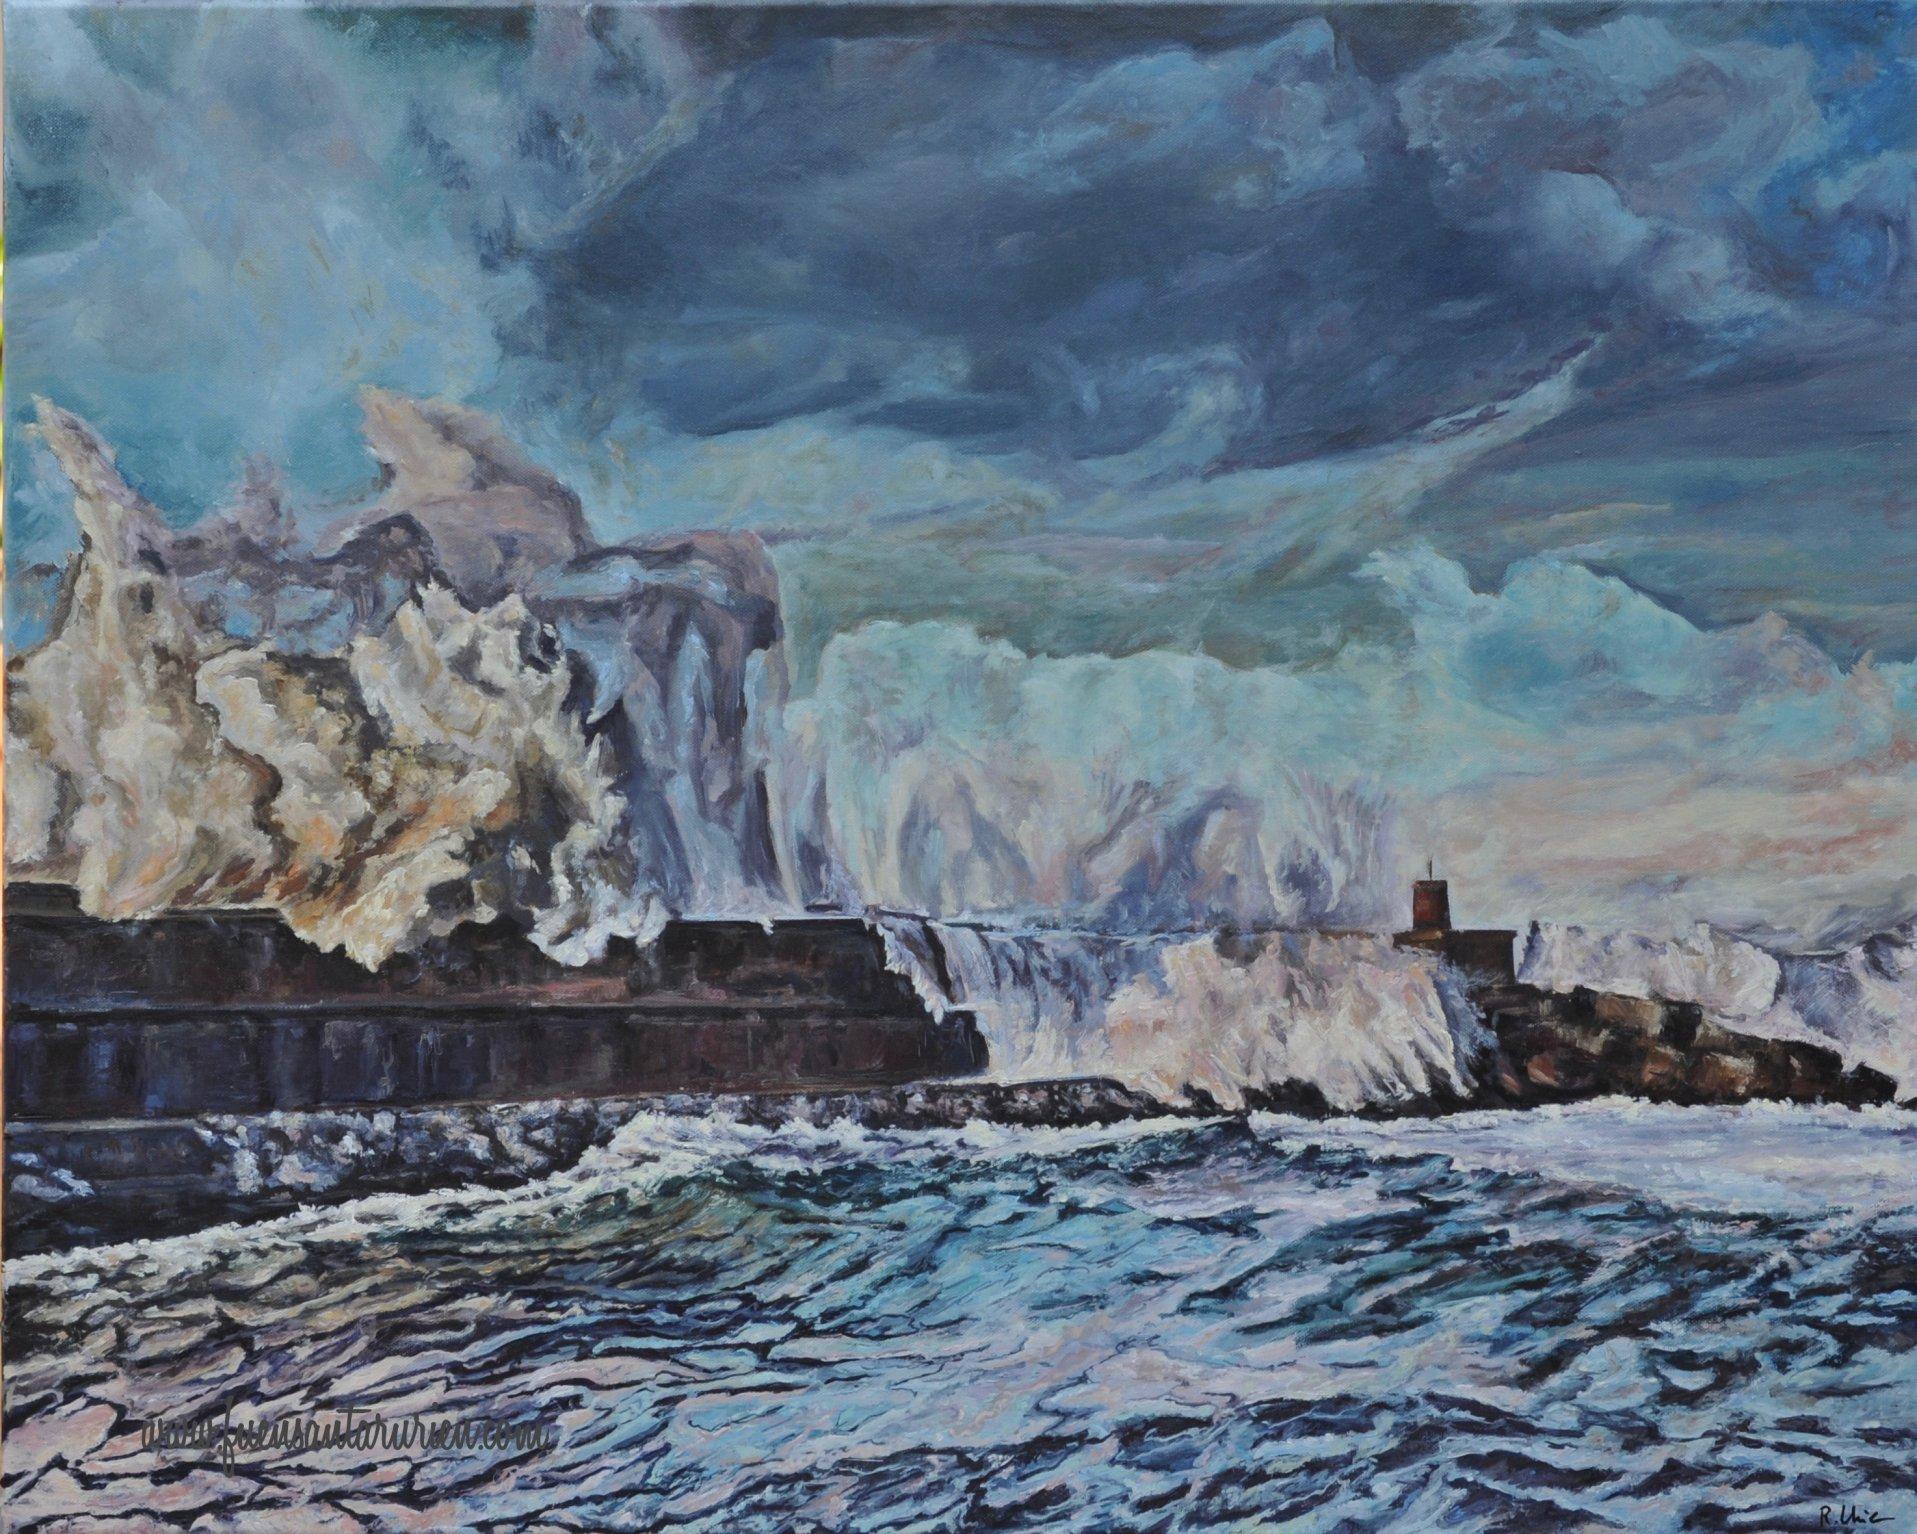 El mar no solo es azul (2018) - Fuensanta Ruiz Urien - Fuensanta R.Urien